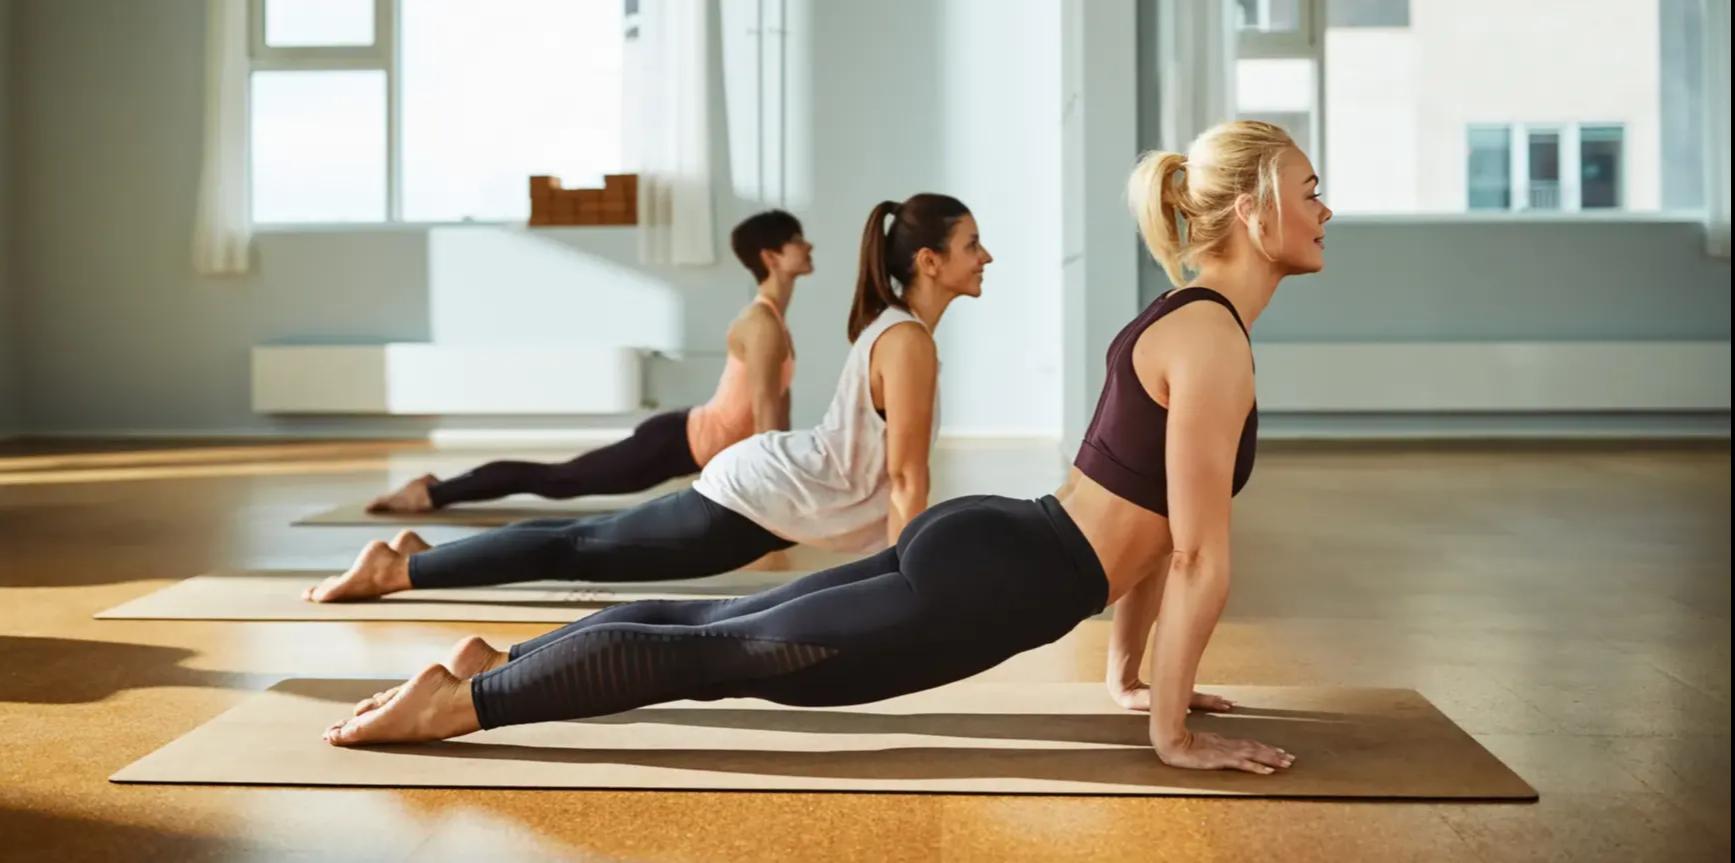 3 Women doing yoga